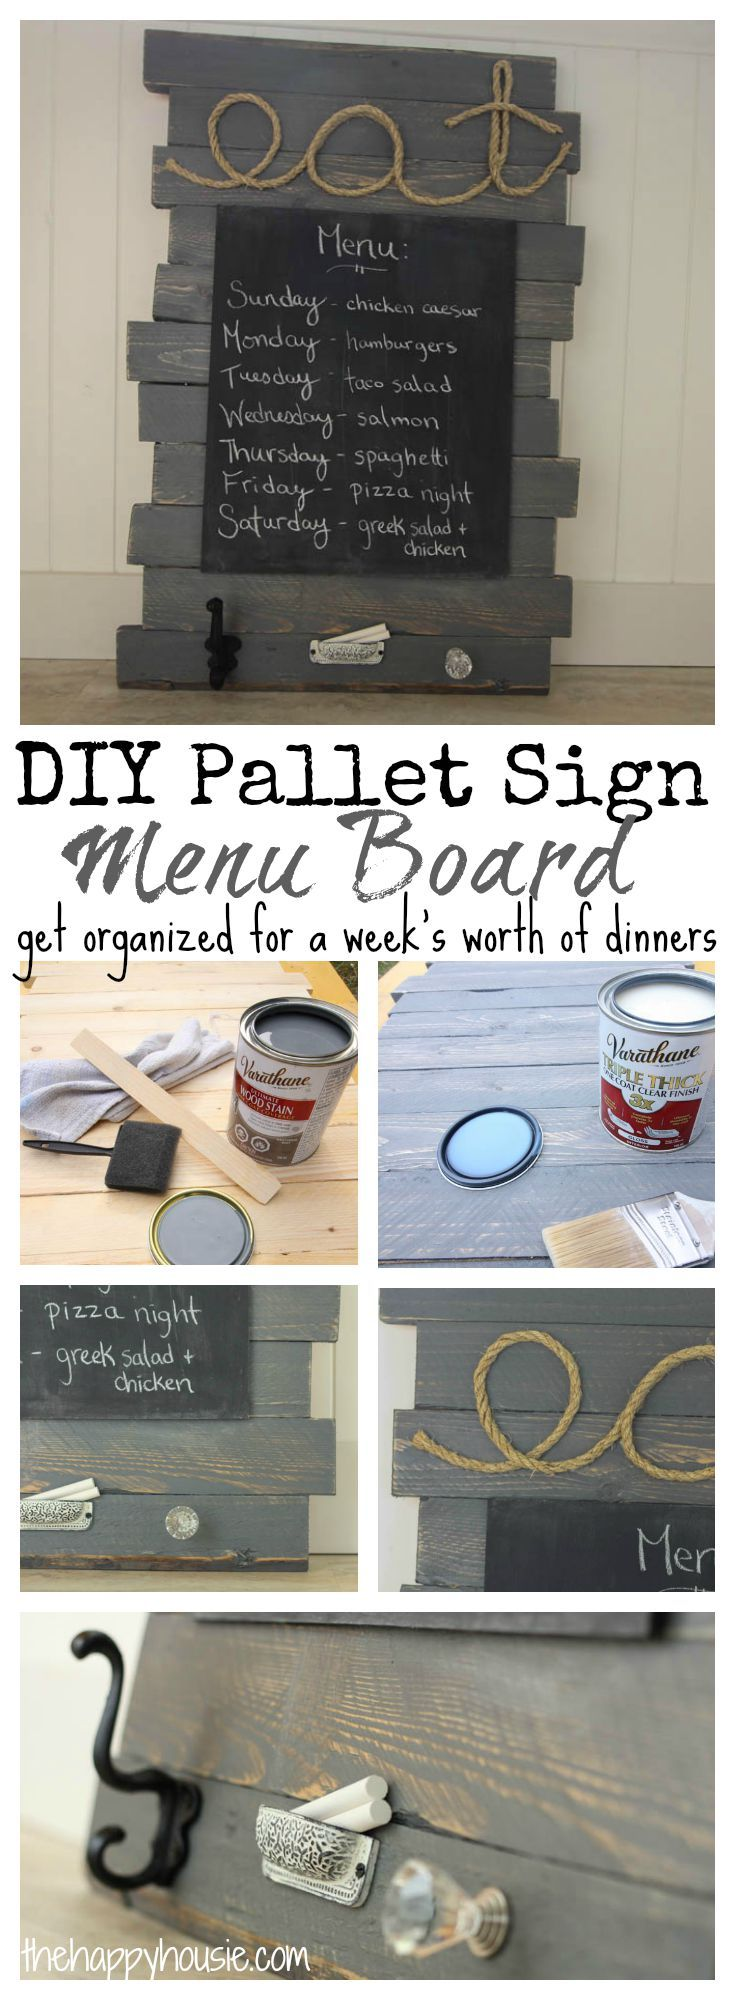 Diy pallet sign menu board menu boards pallets and organizing diy pallet sign menu board the happy housie solutioingenieria Images